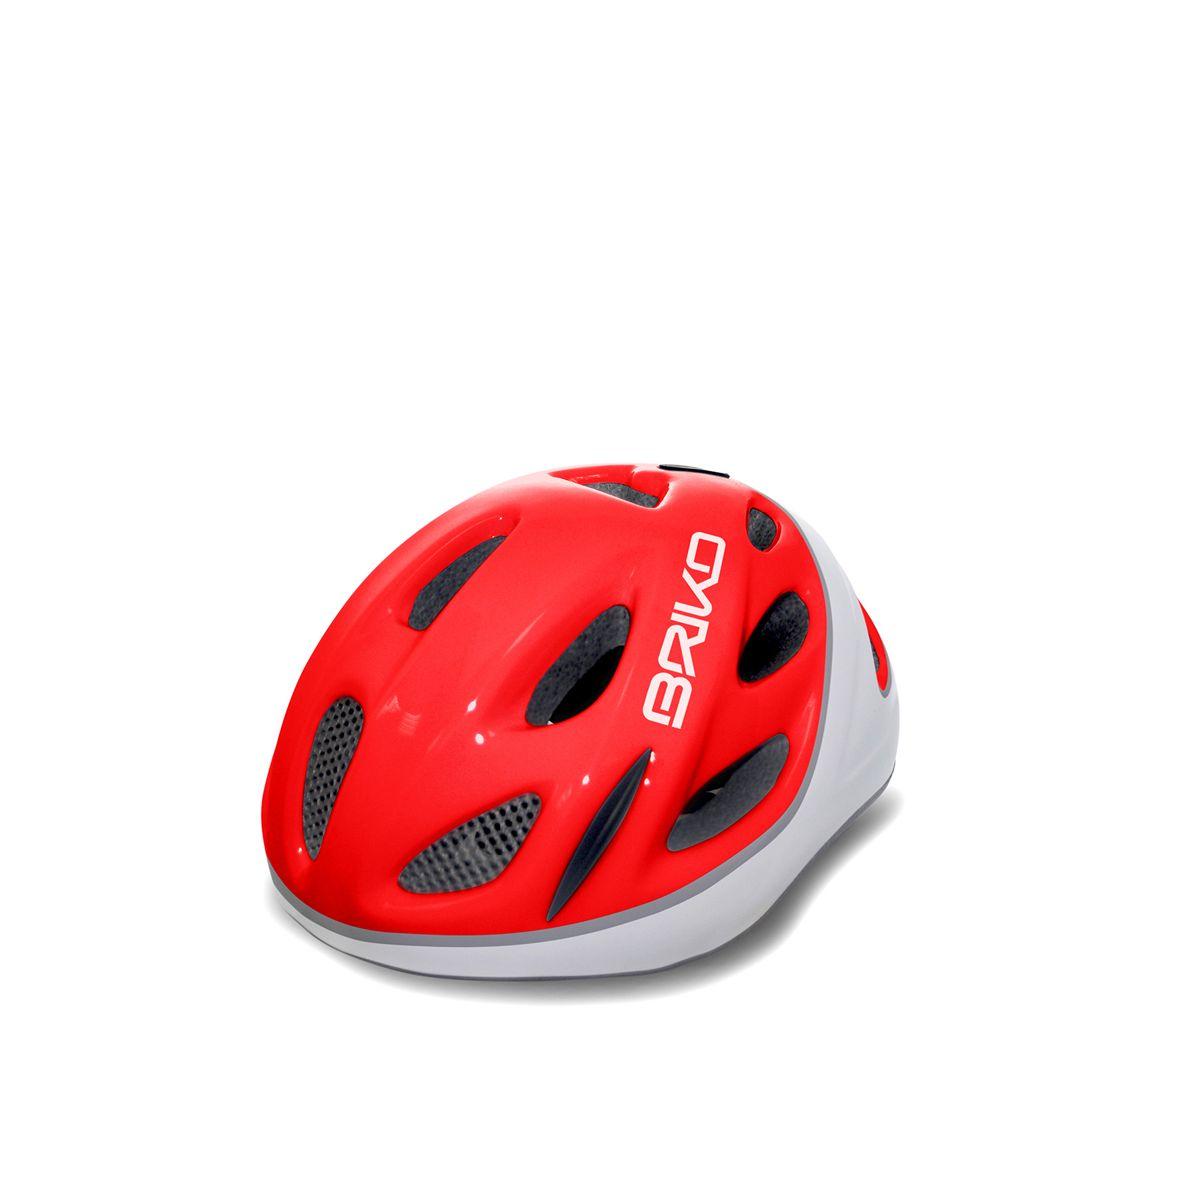 r013-red-white-silv